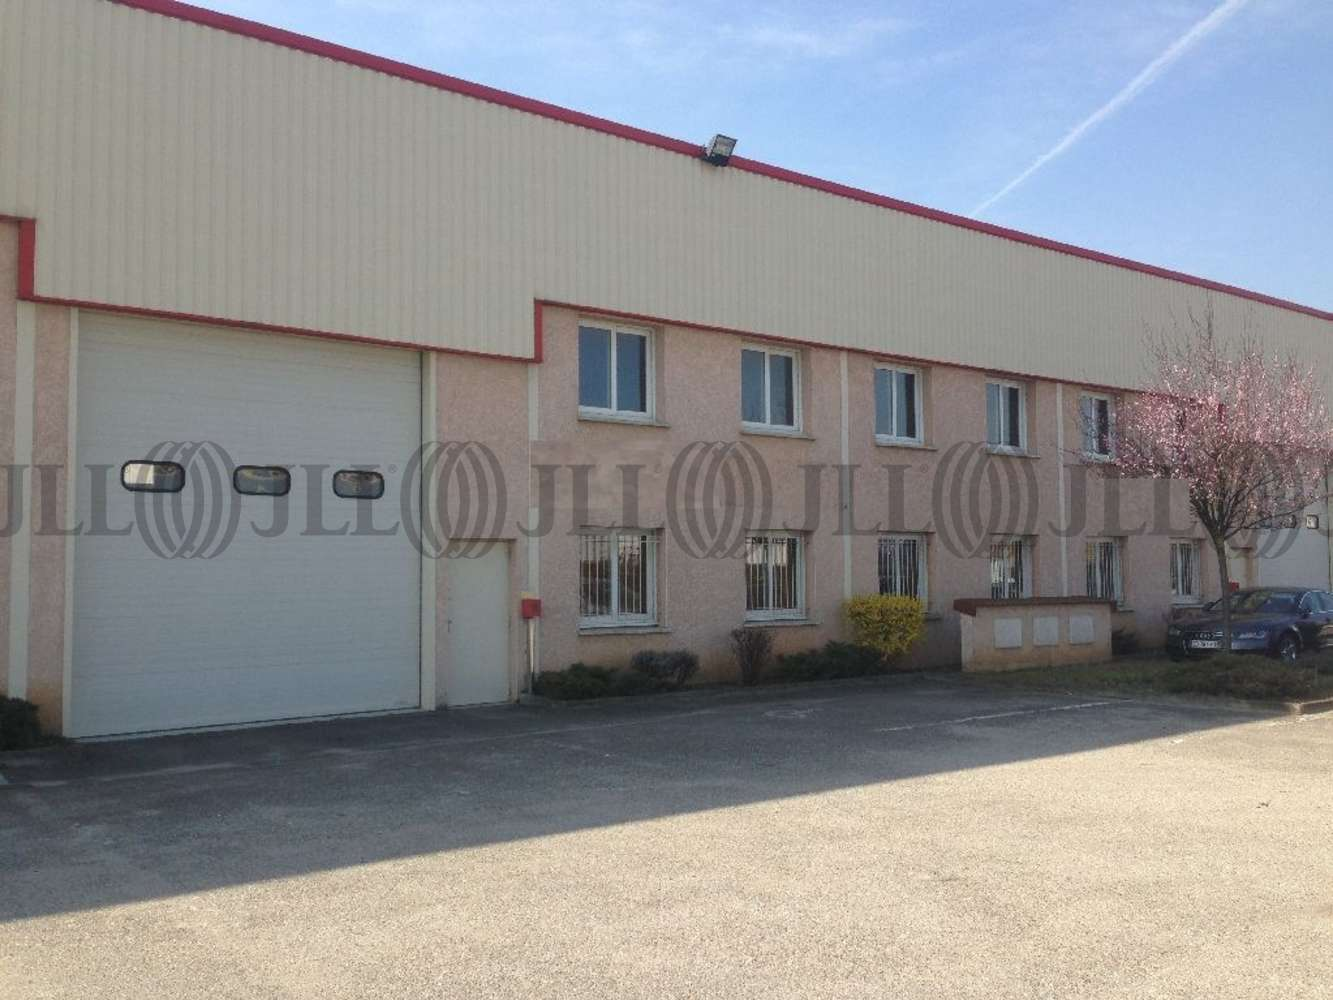 Activités/entrepôt Chassieu, 69680 - Location entrepot Chassieu - Lyon (69)